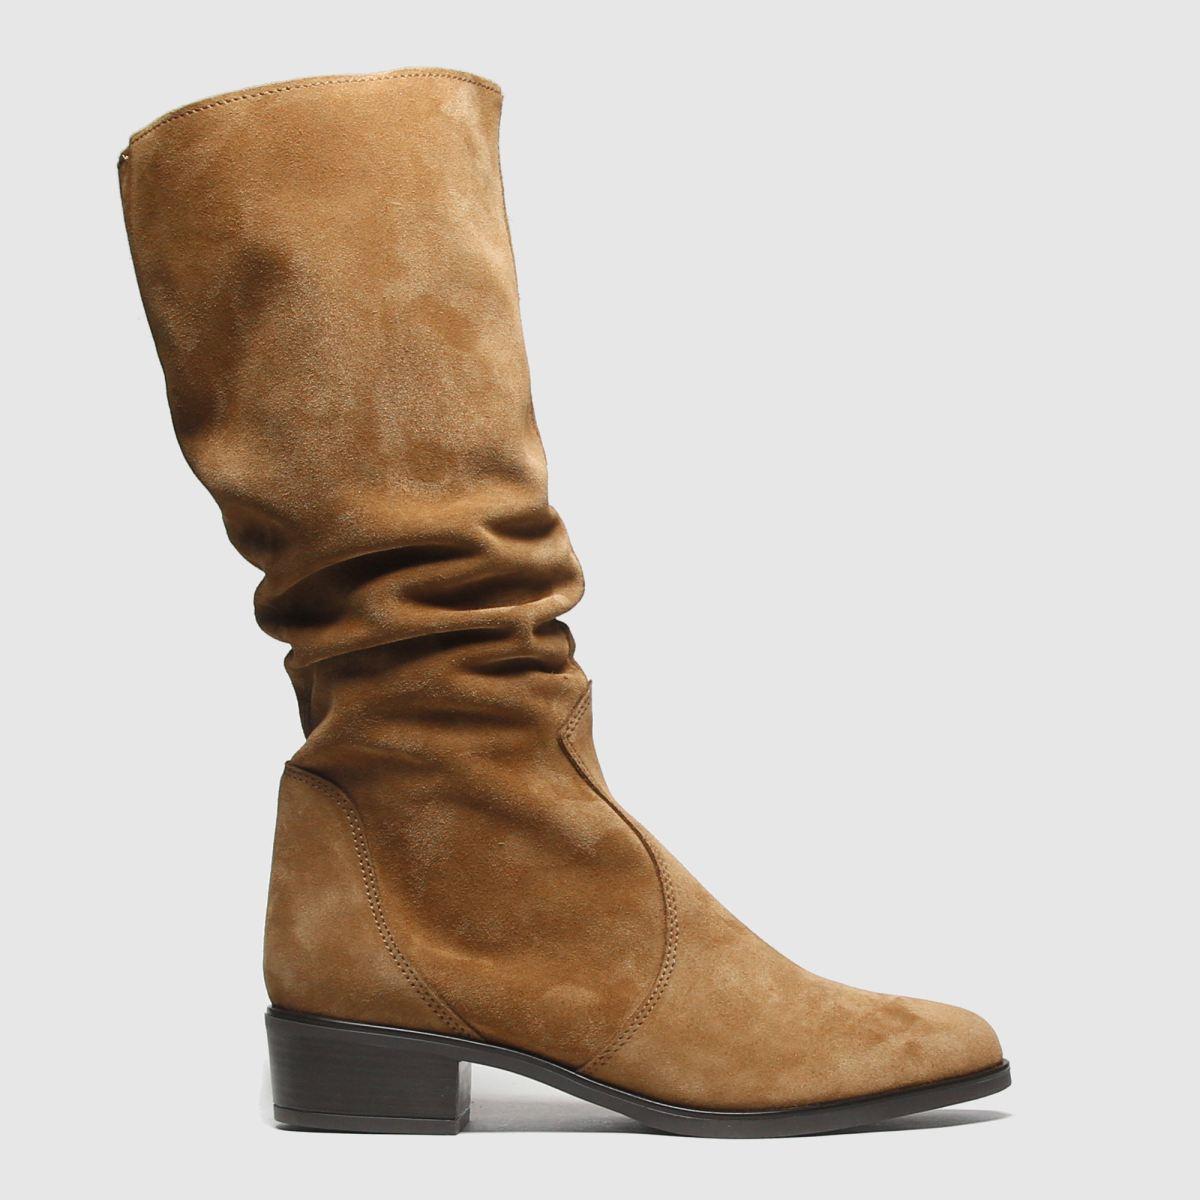 schuh Schuh Tan Mysterious Boots